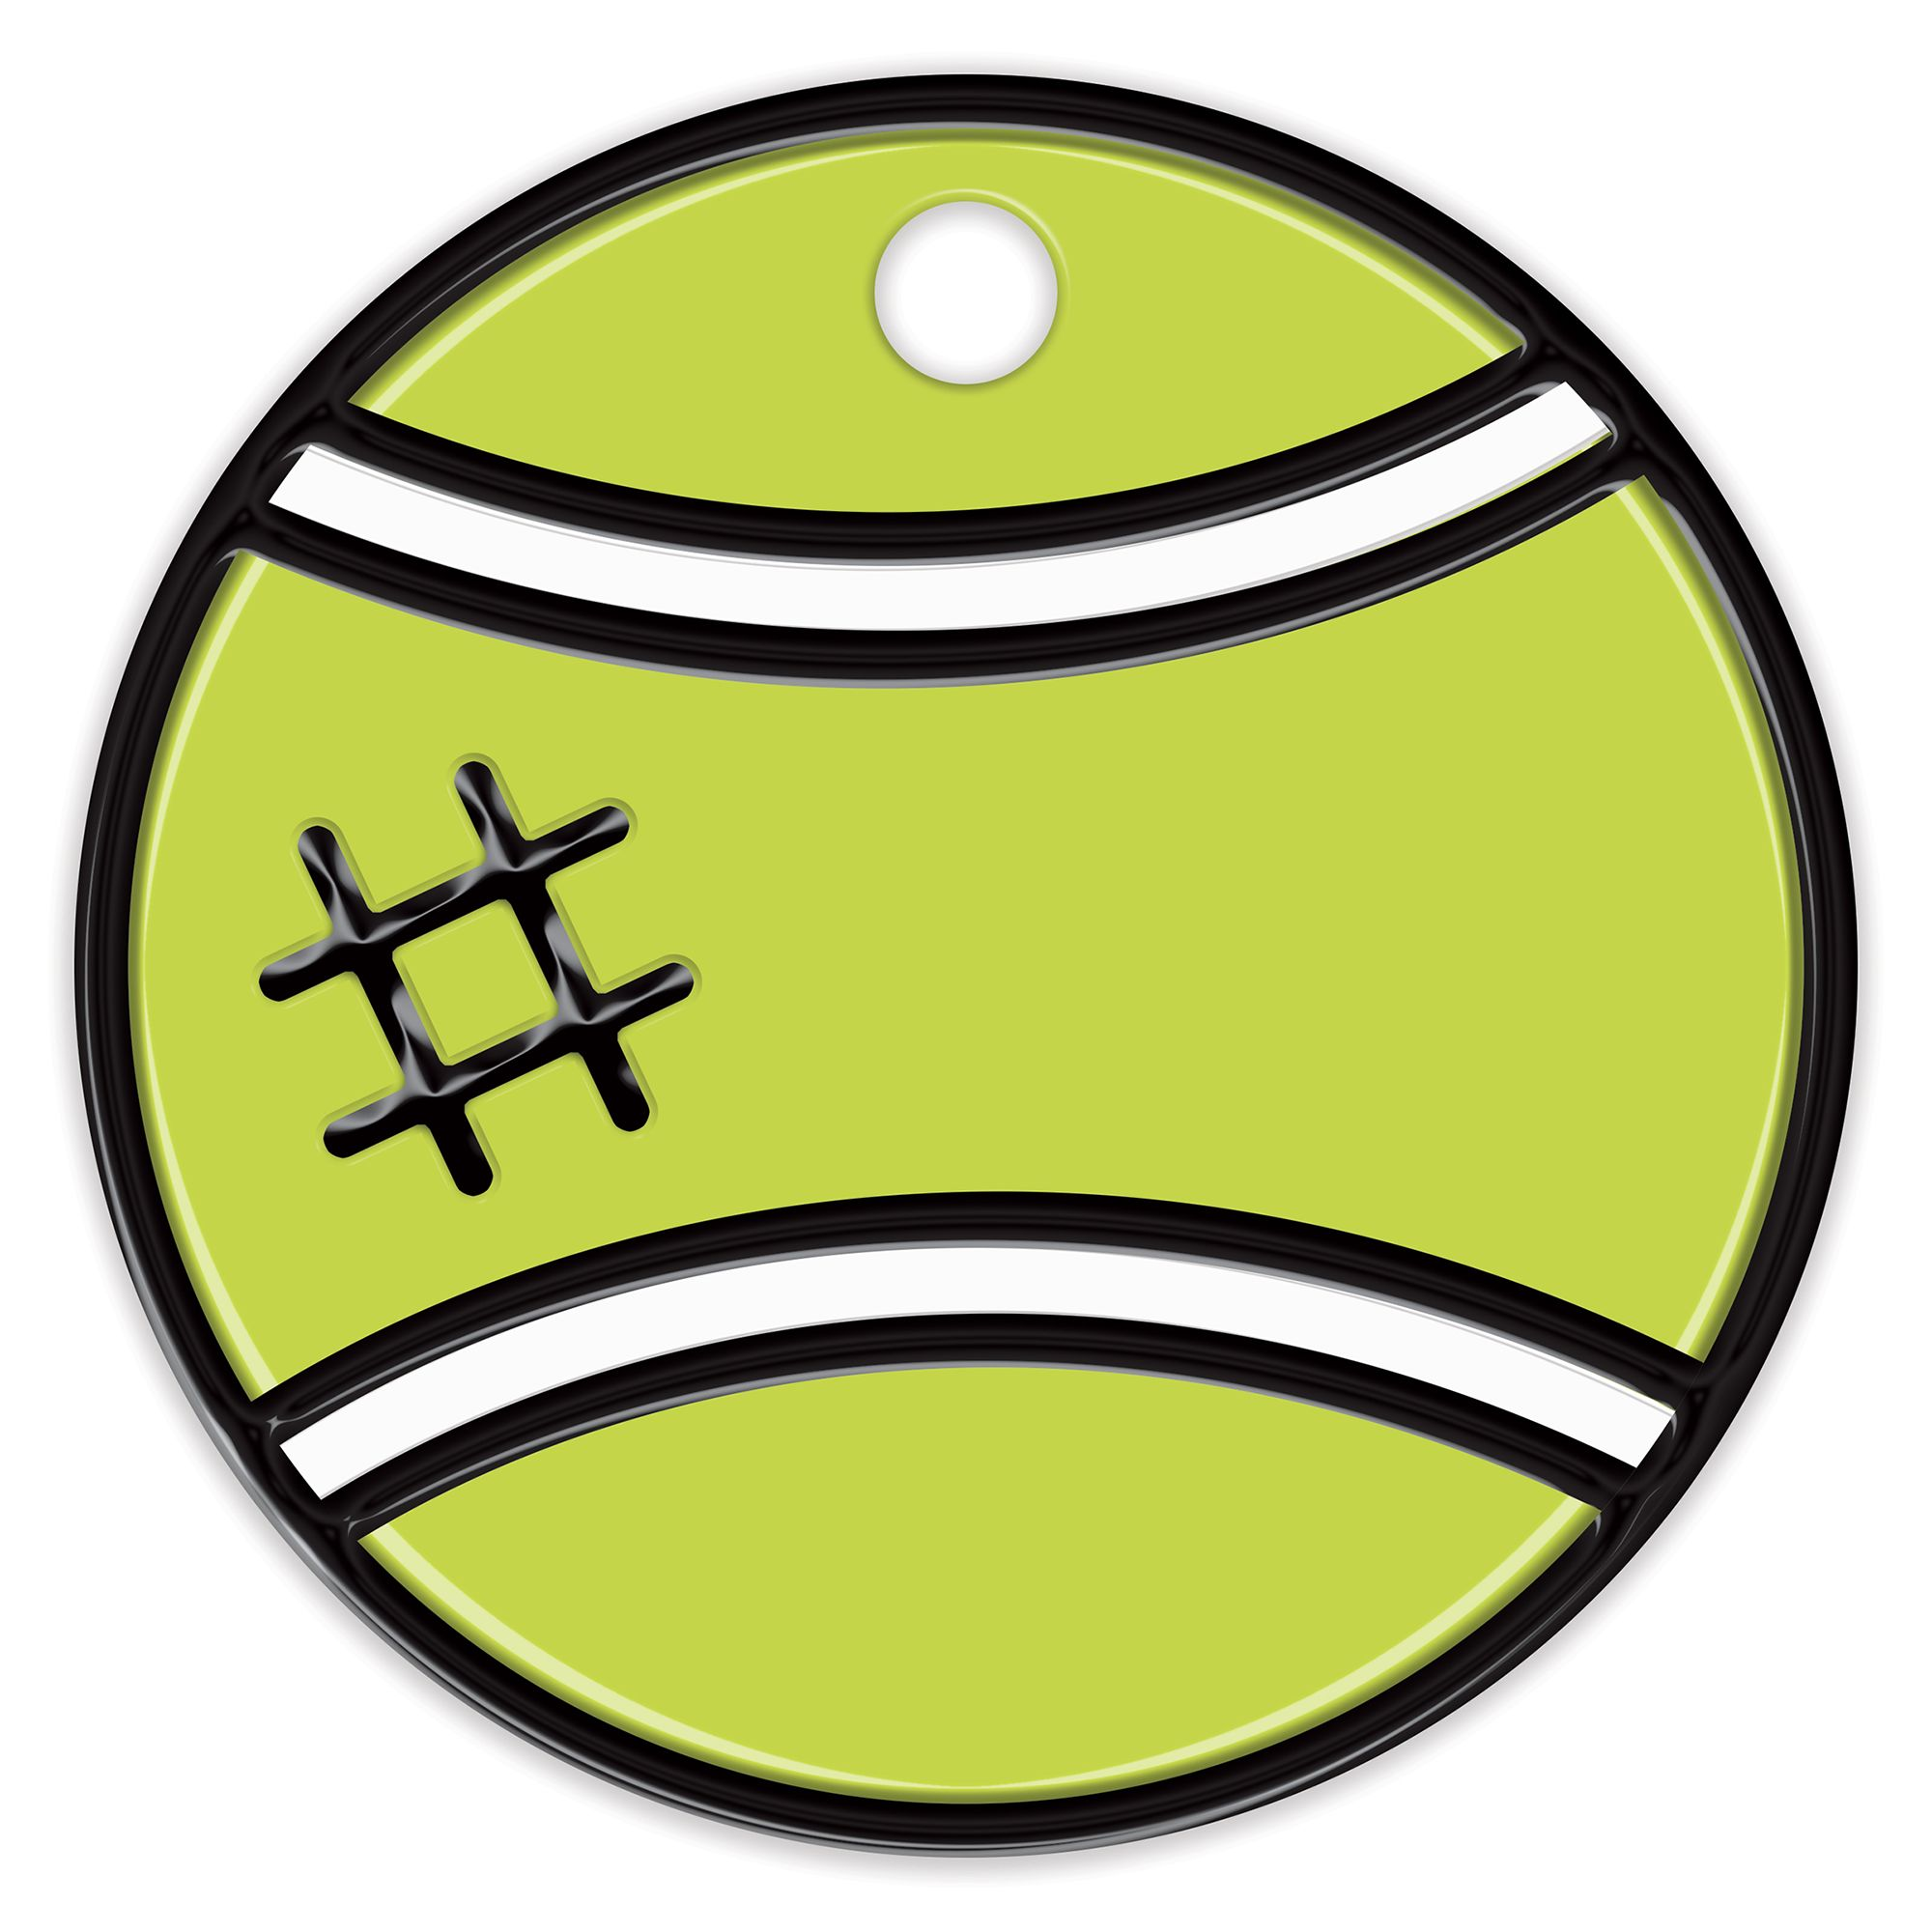 Petfetch Smart Pet Tag Tennis Ball Smart Tags